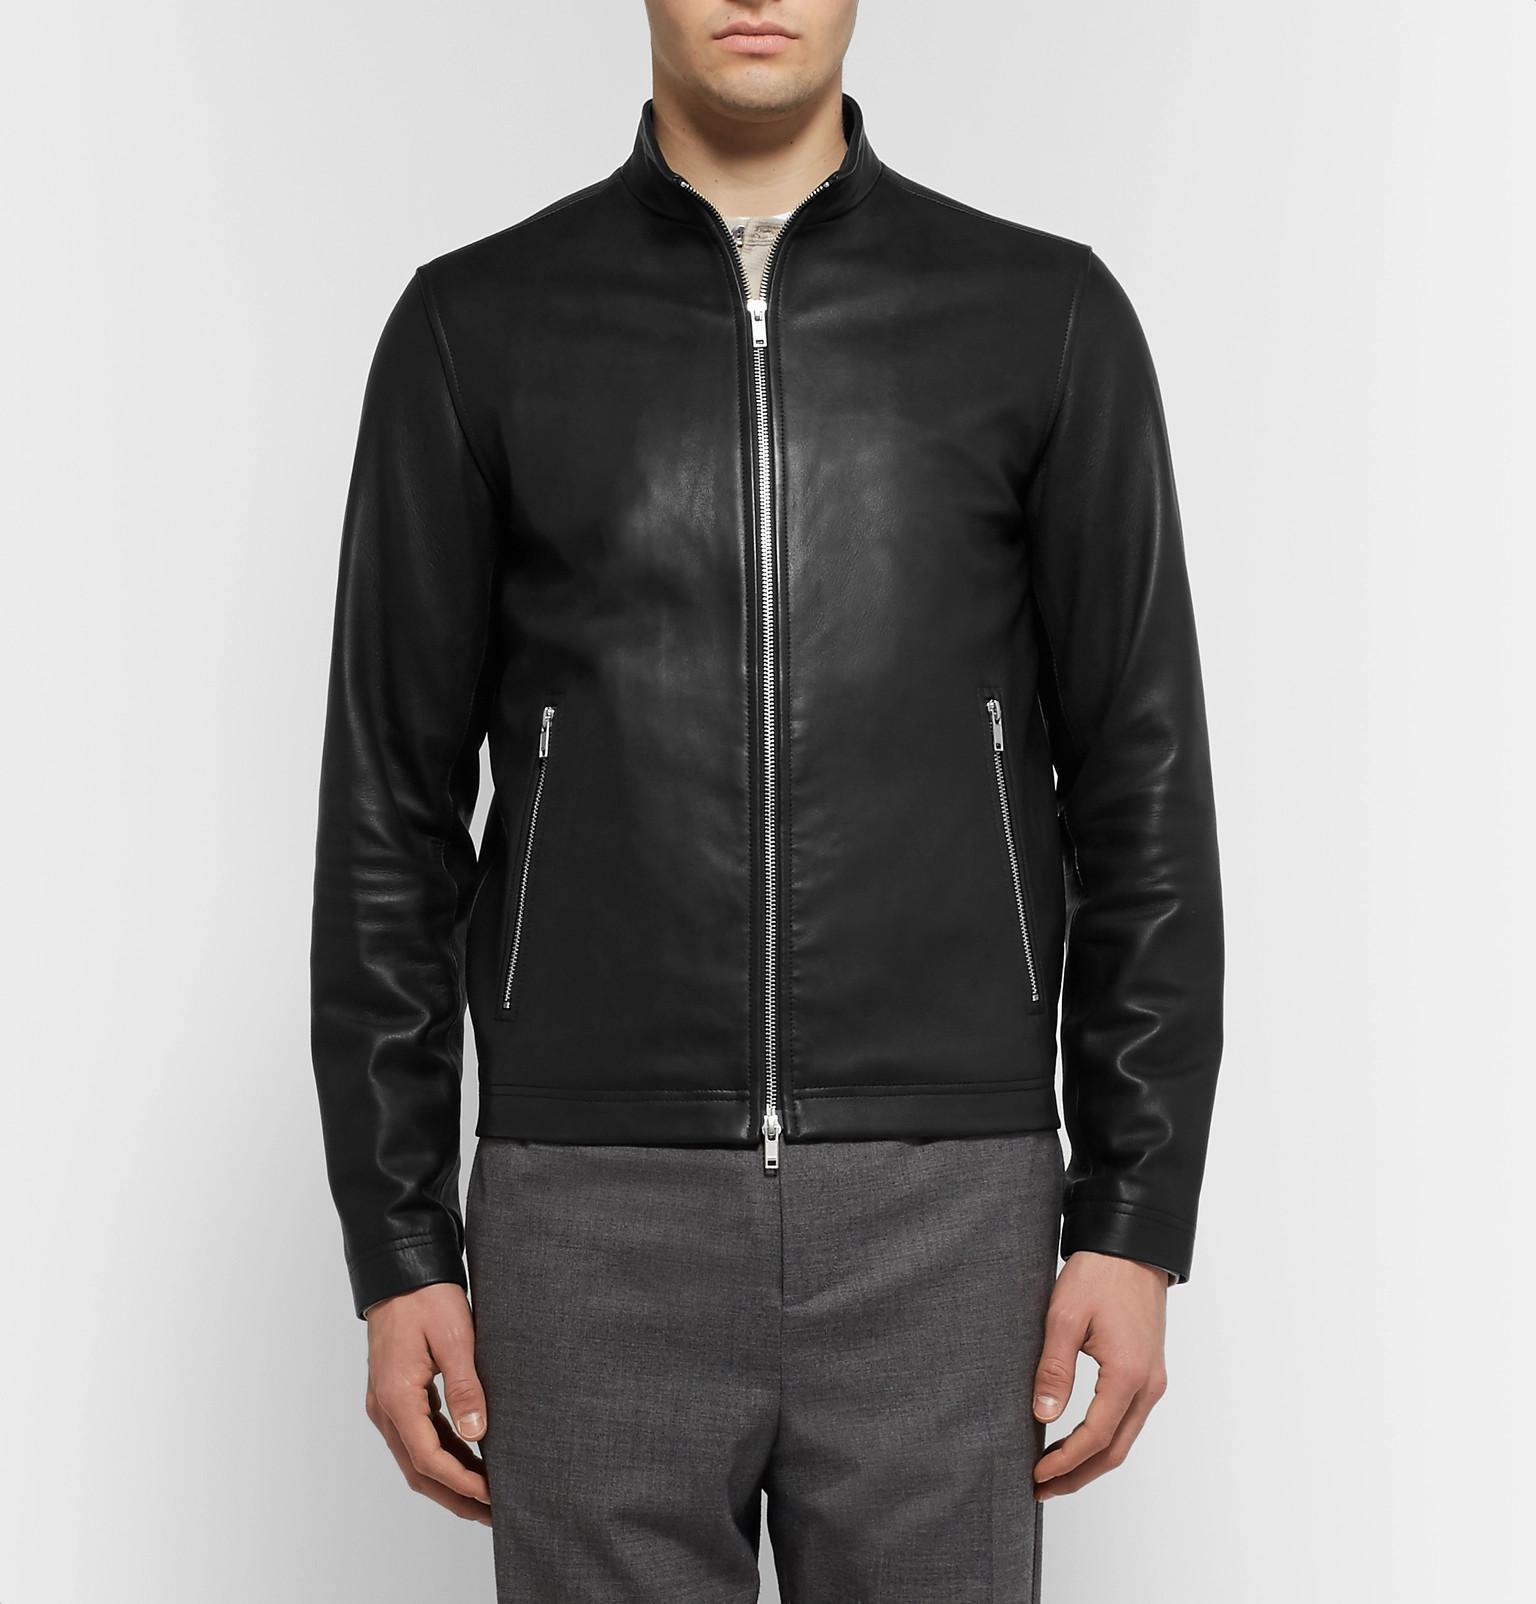 Racer Fullscreen Morvek Café Men Lyst Theory View Leather For Jacket Black 6vngxwt